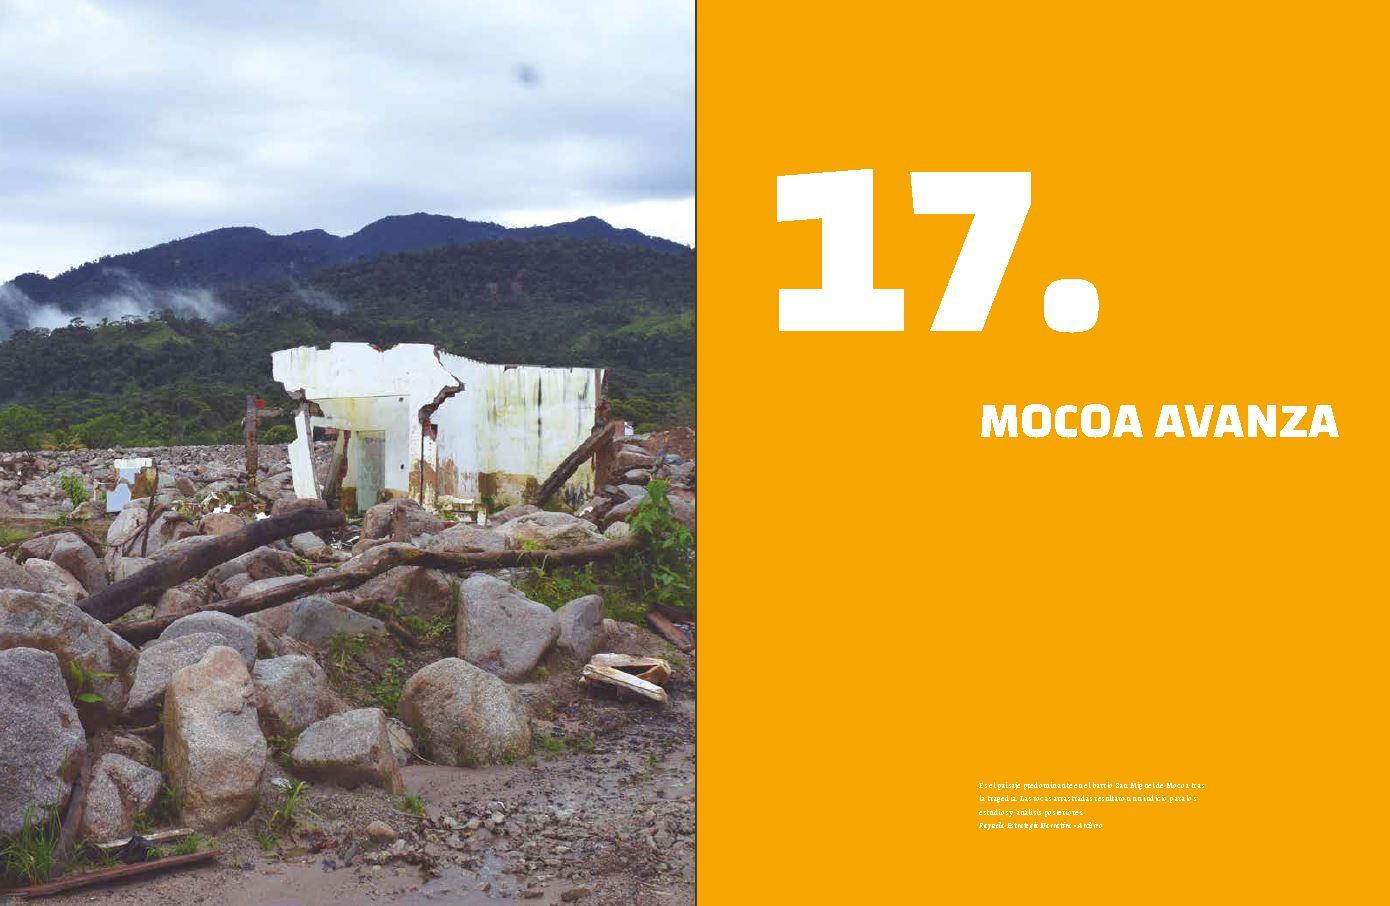 Colombia Menos Vulnerable